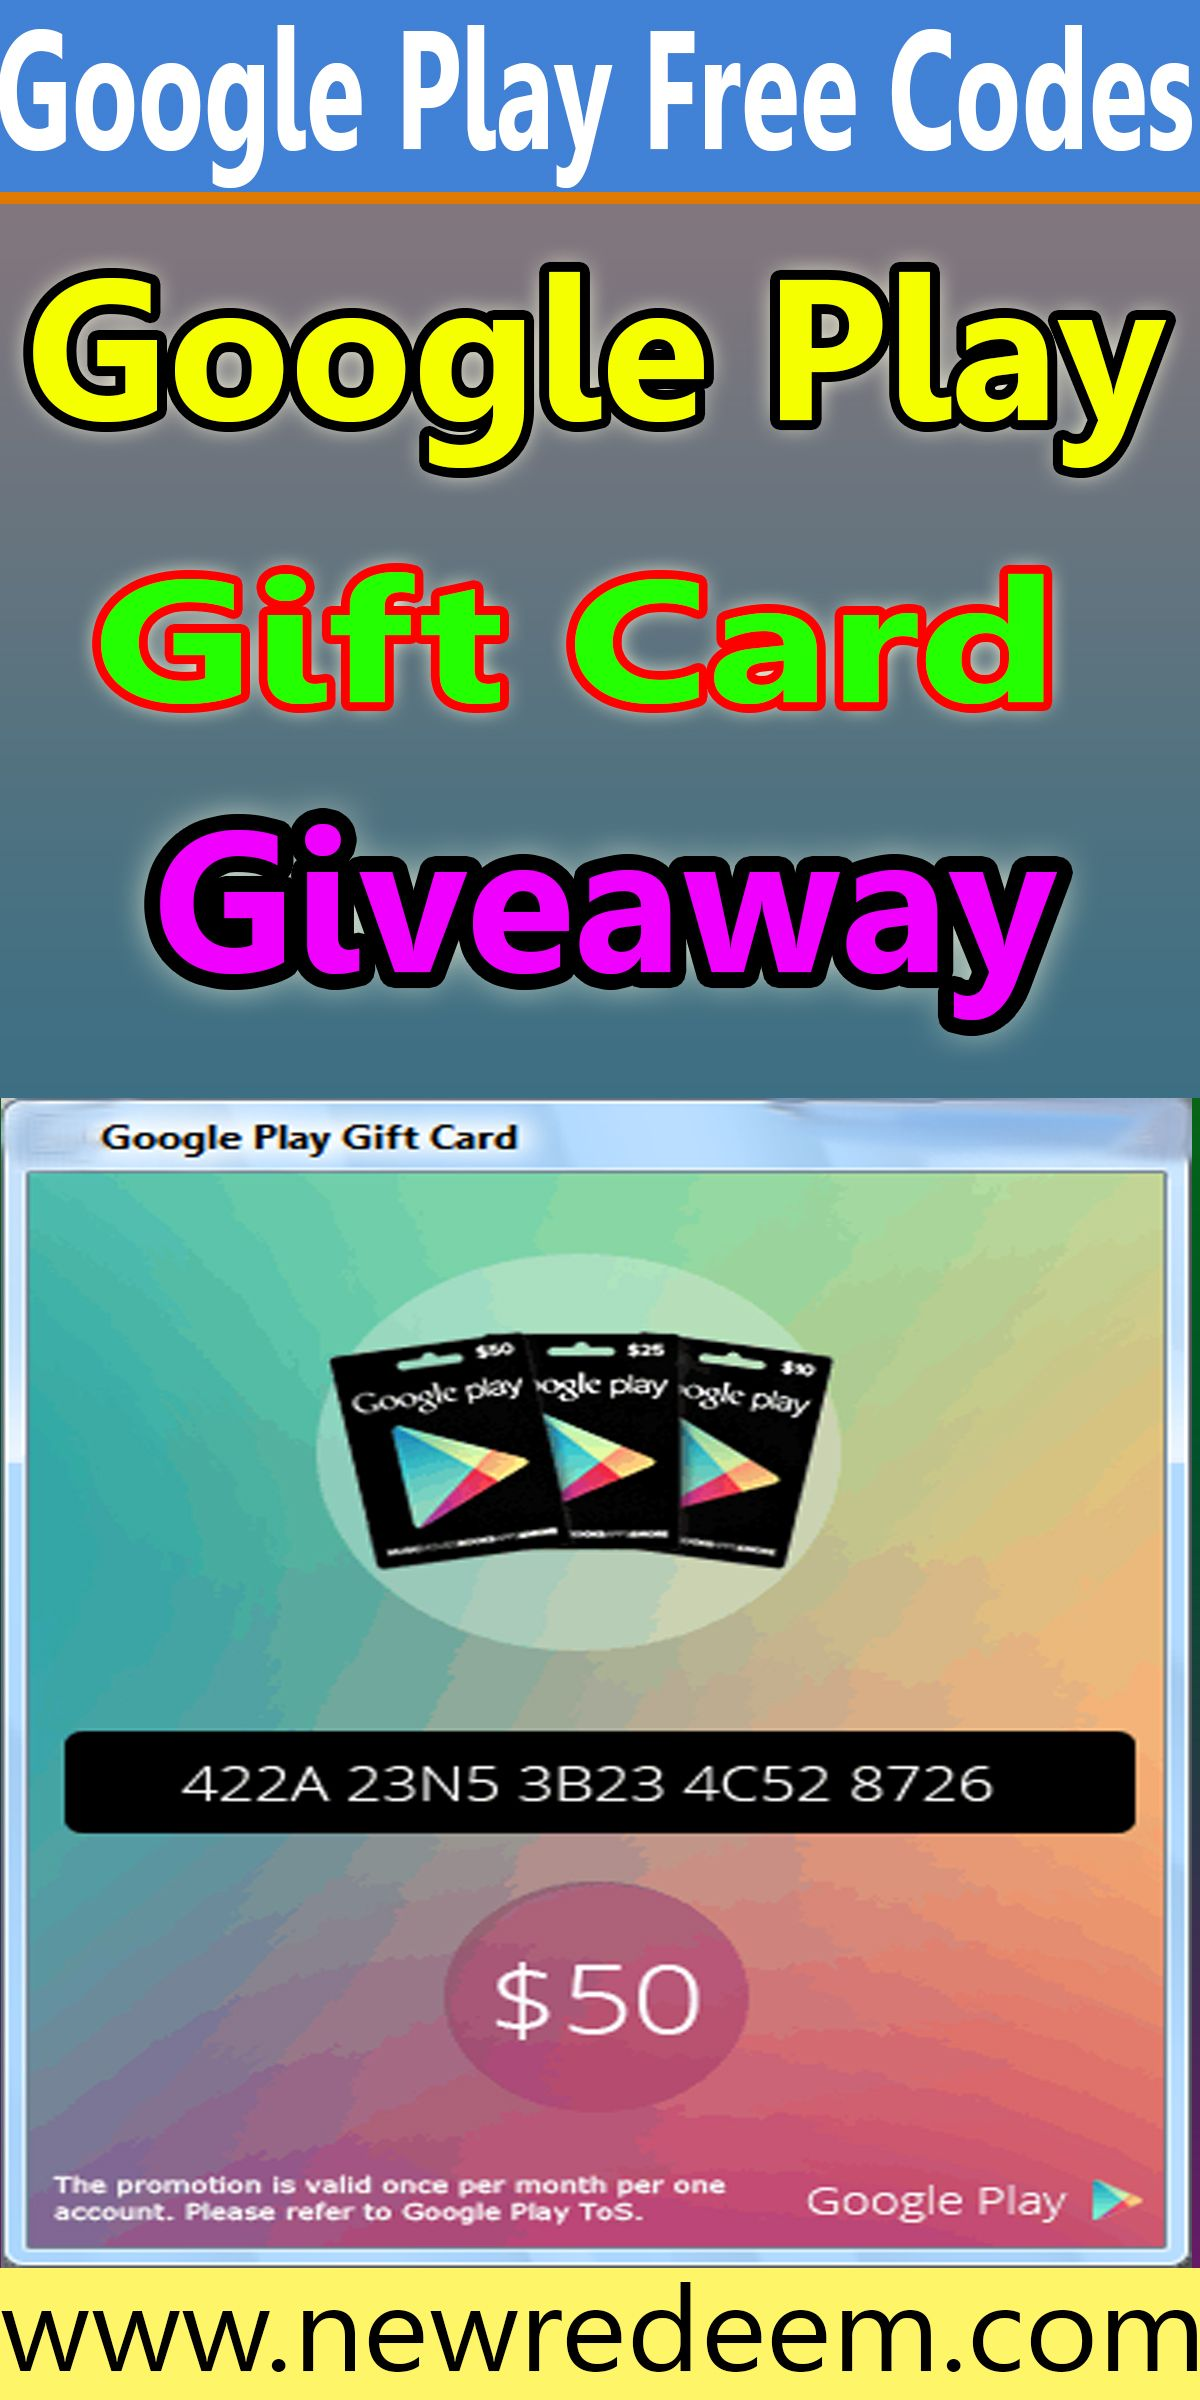 Free Google Play Gift Card Unused Codes Generator 2020 Google Play